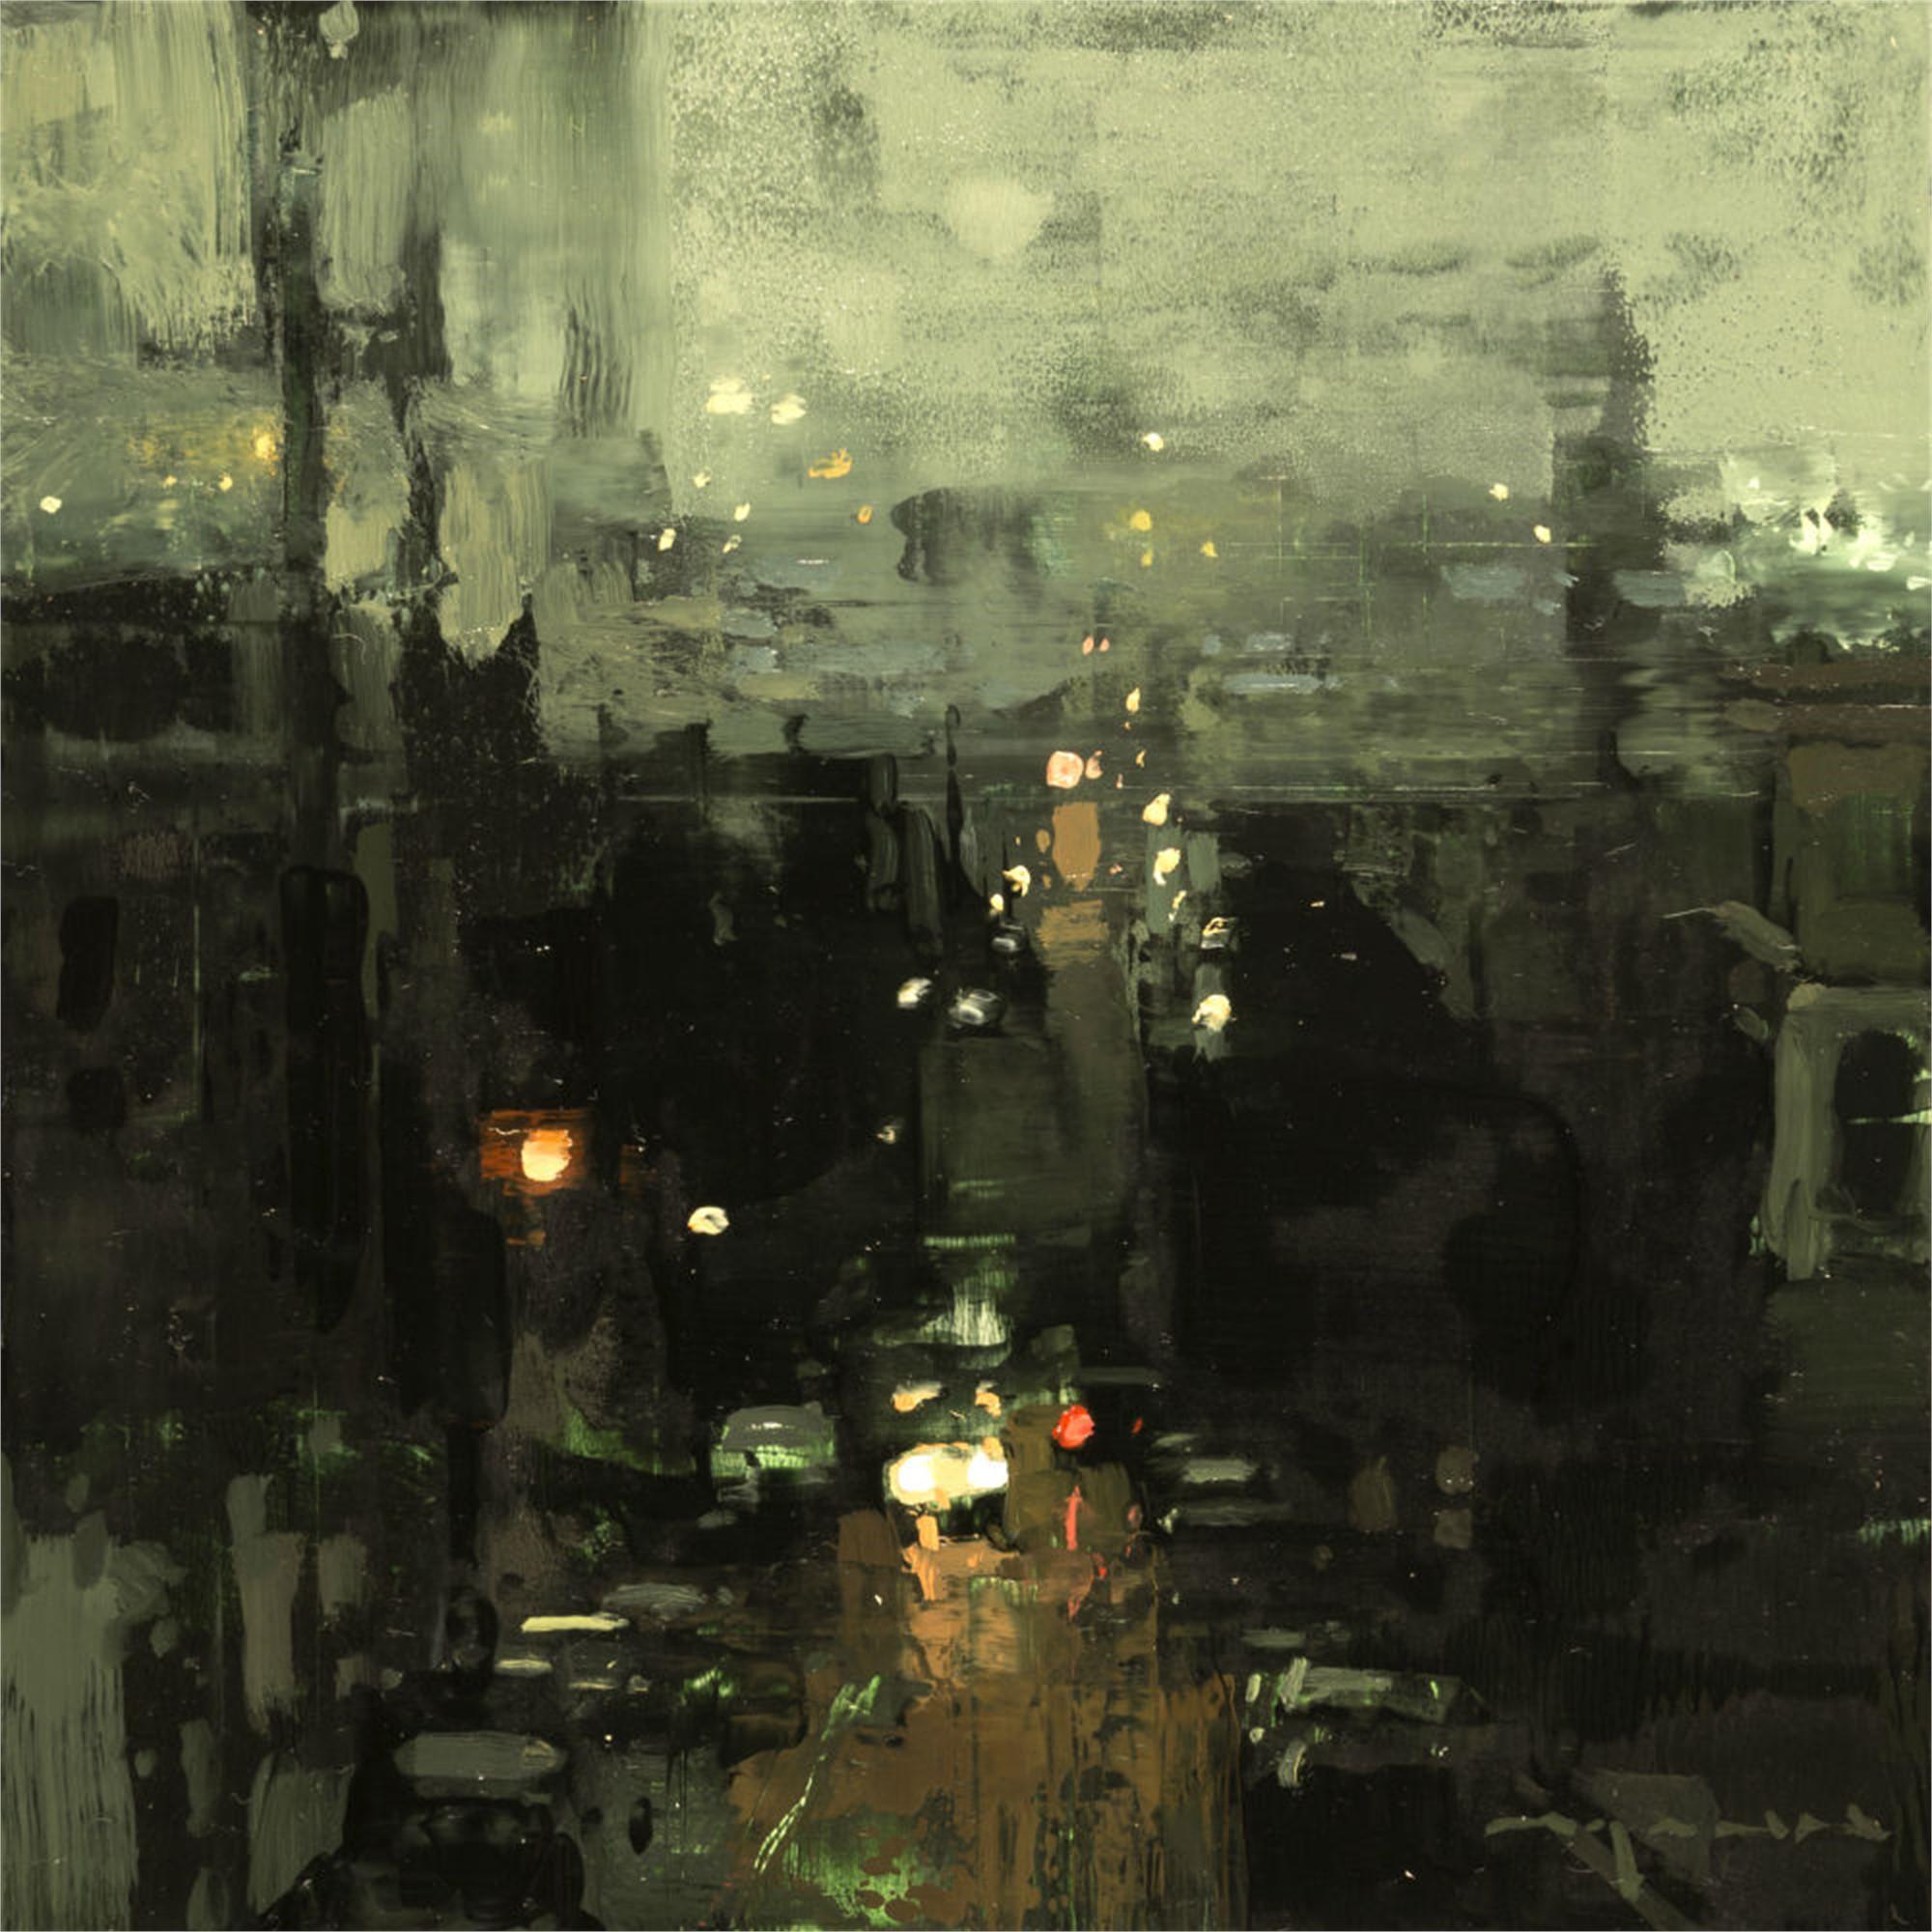 Cityscape - Composed Form Study no. 25 by Jeremy Mann